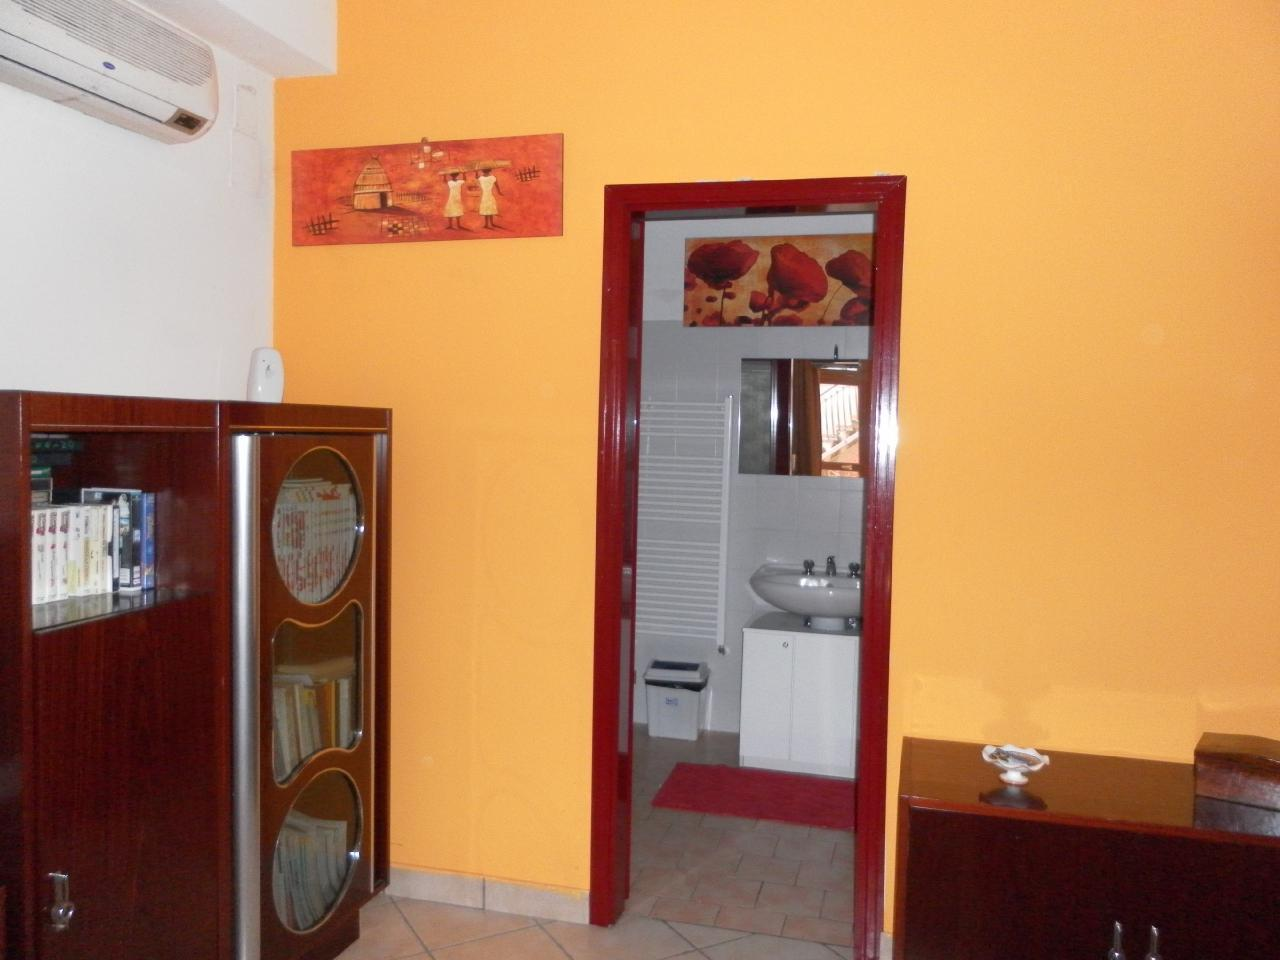 Appartement de vacances ZUHAUSE VON EMILIA - zwischen Ätna und Taormina (1743739), Aci Sant'Antonio, Catania, Sicile, Italie, image 4